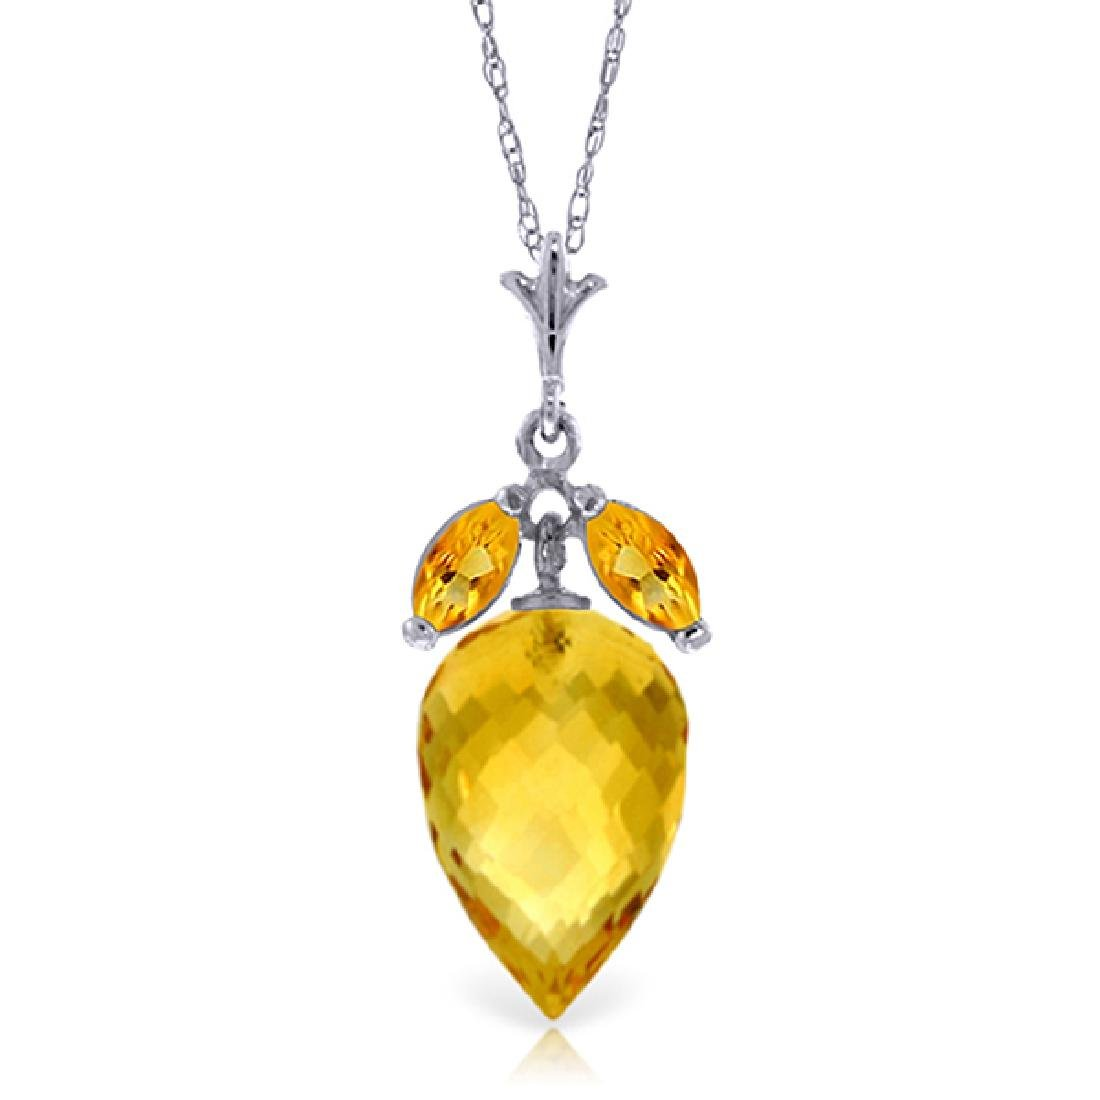 Genuine 10 ctw Citrine Necklace Jewelry 14KT White Gold